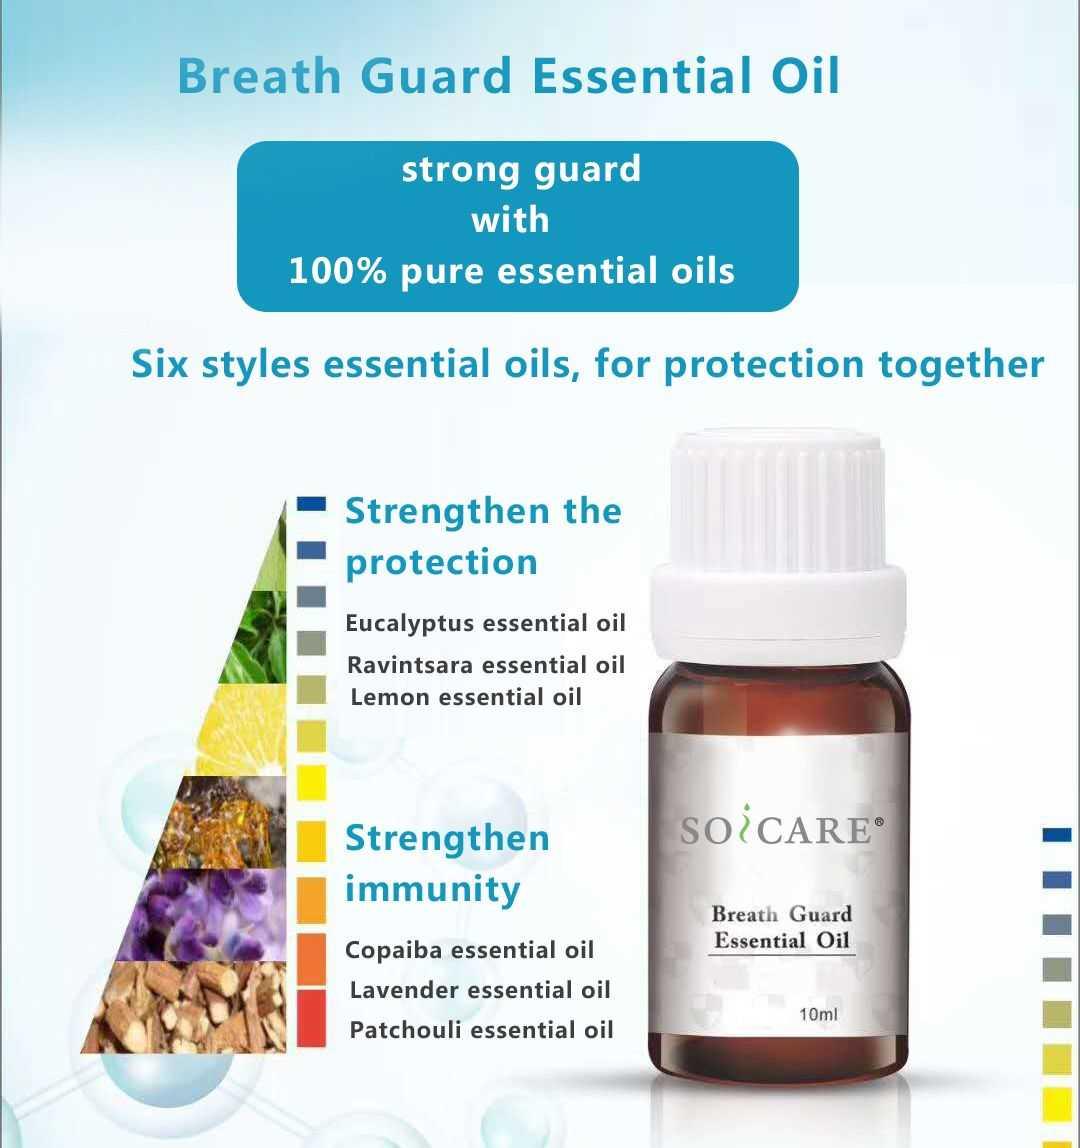 Bland essensielle oljer pustebeskyttelse essensiell olje for diffusor